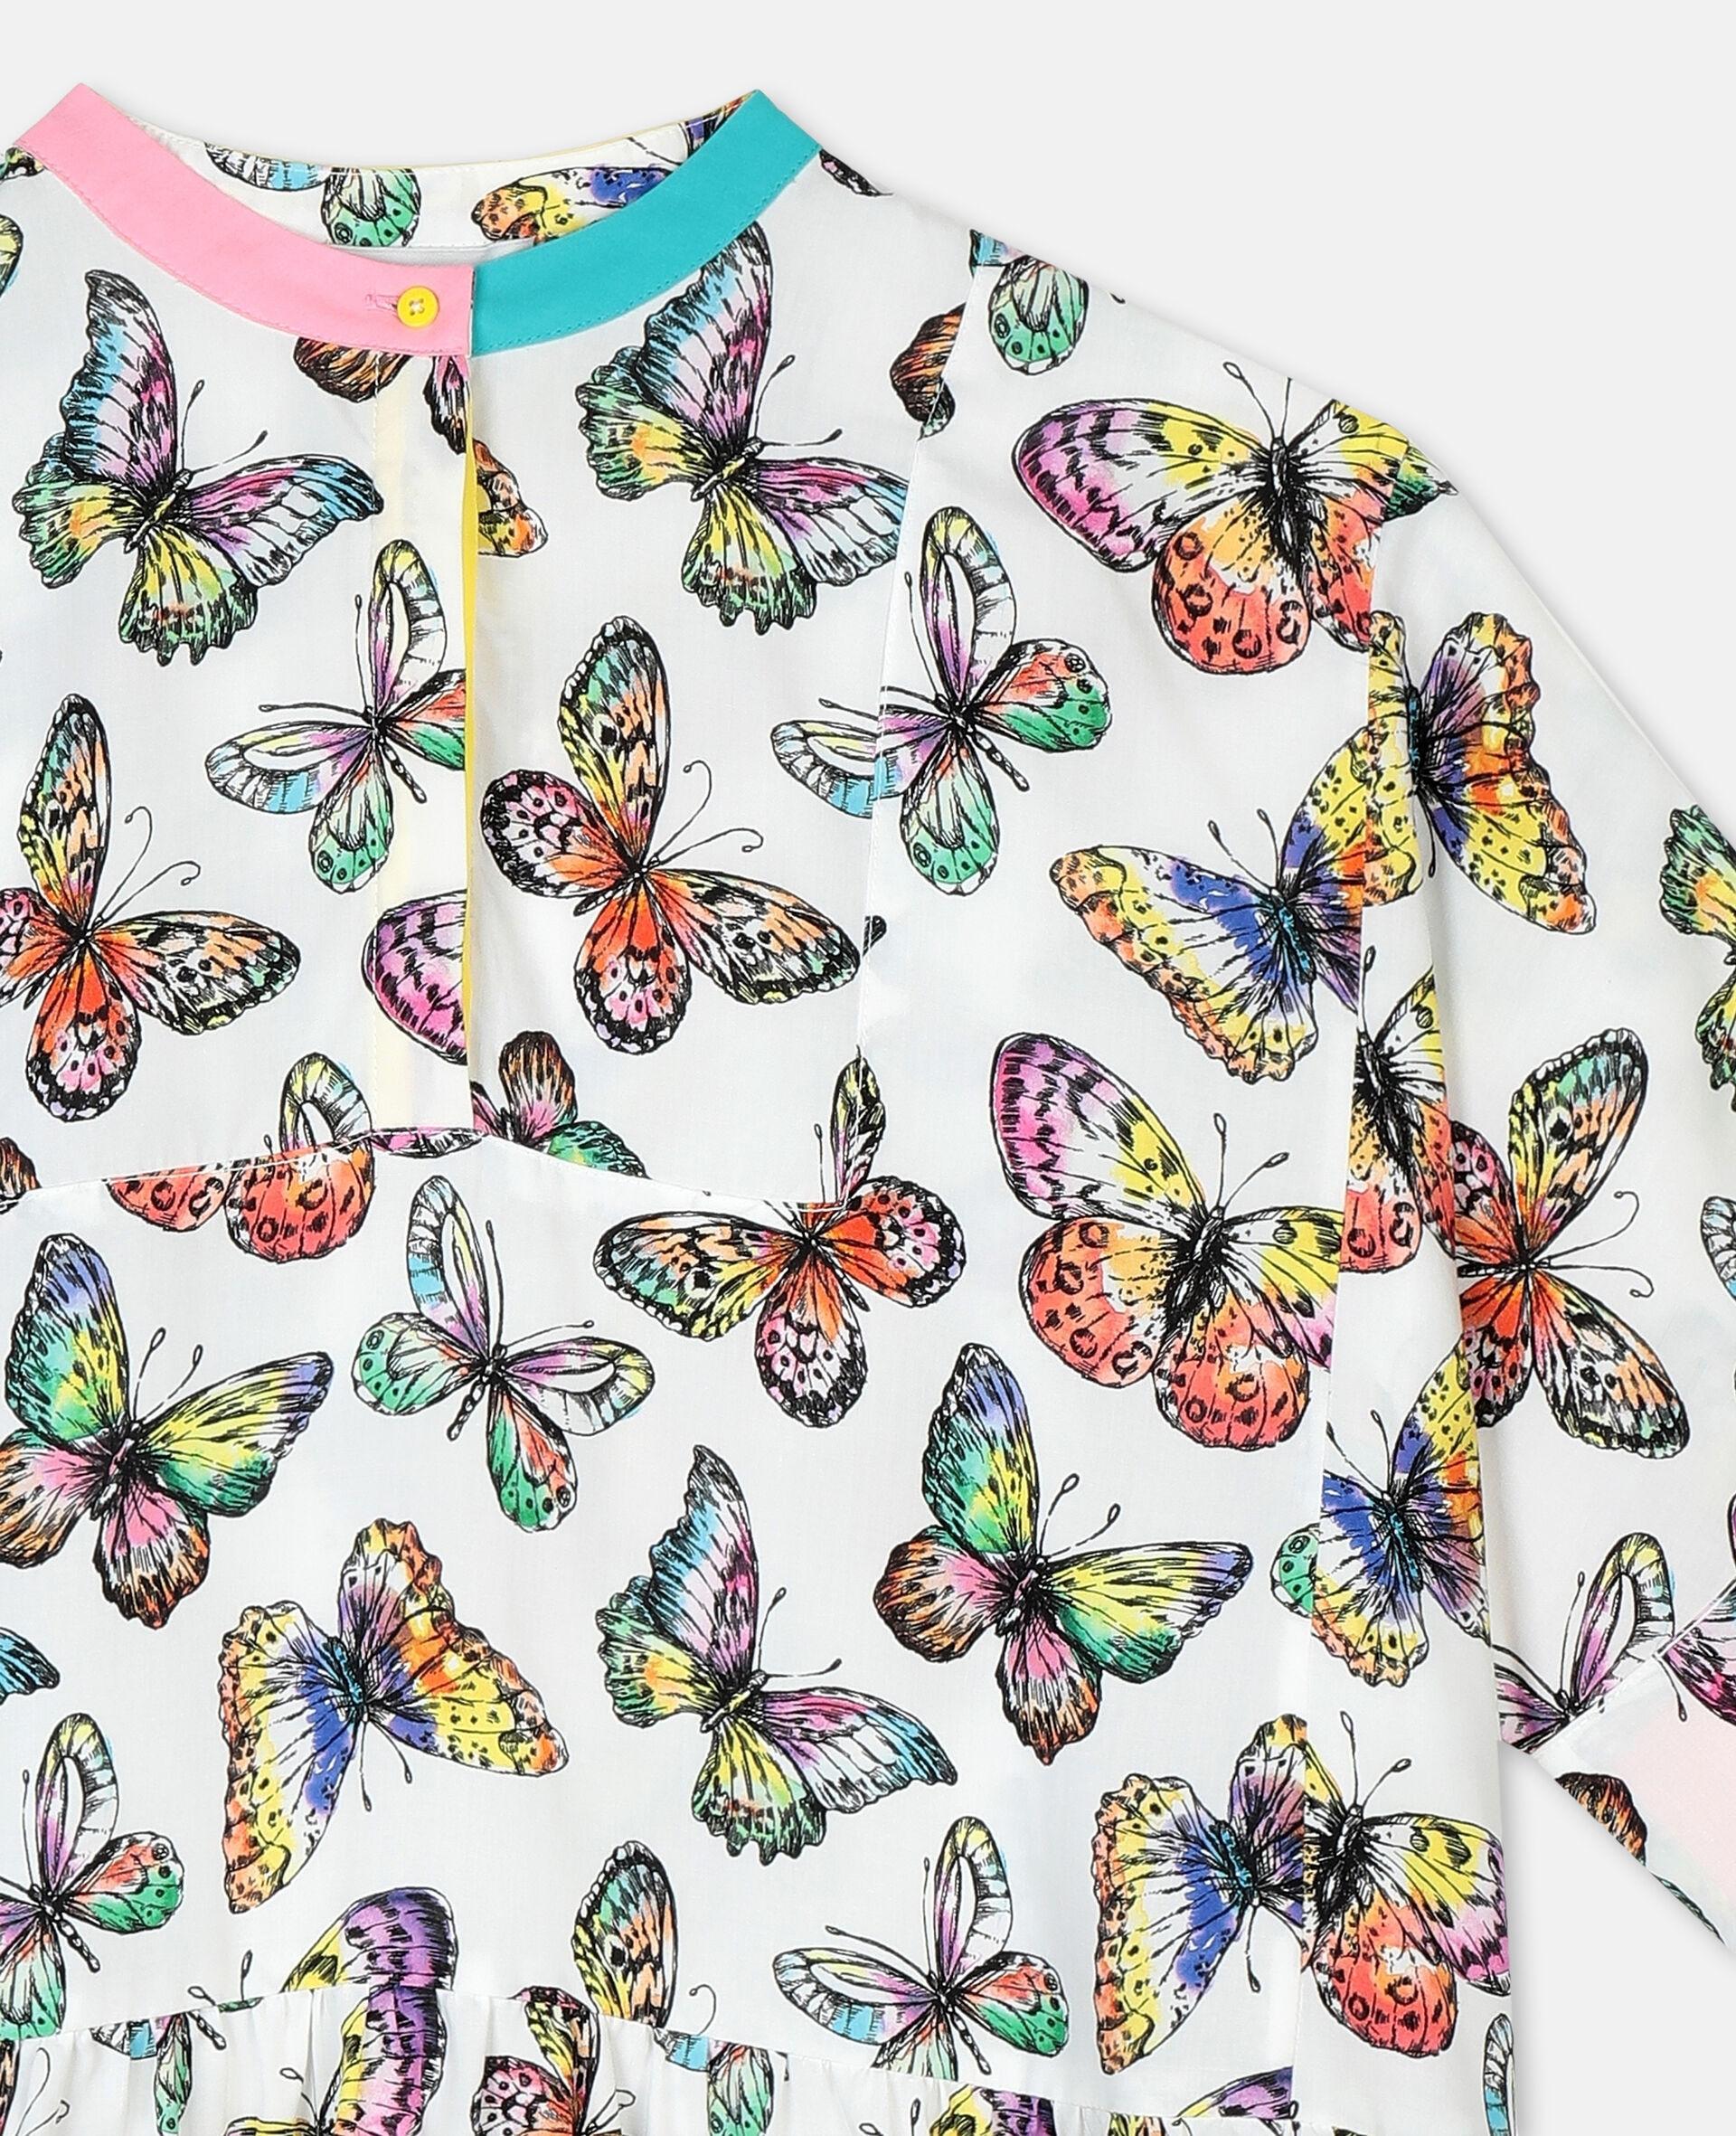 Oversized-Kleid aus Viskose mit Schmetterlingen-Bunt-large image number 1